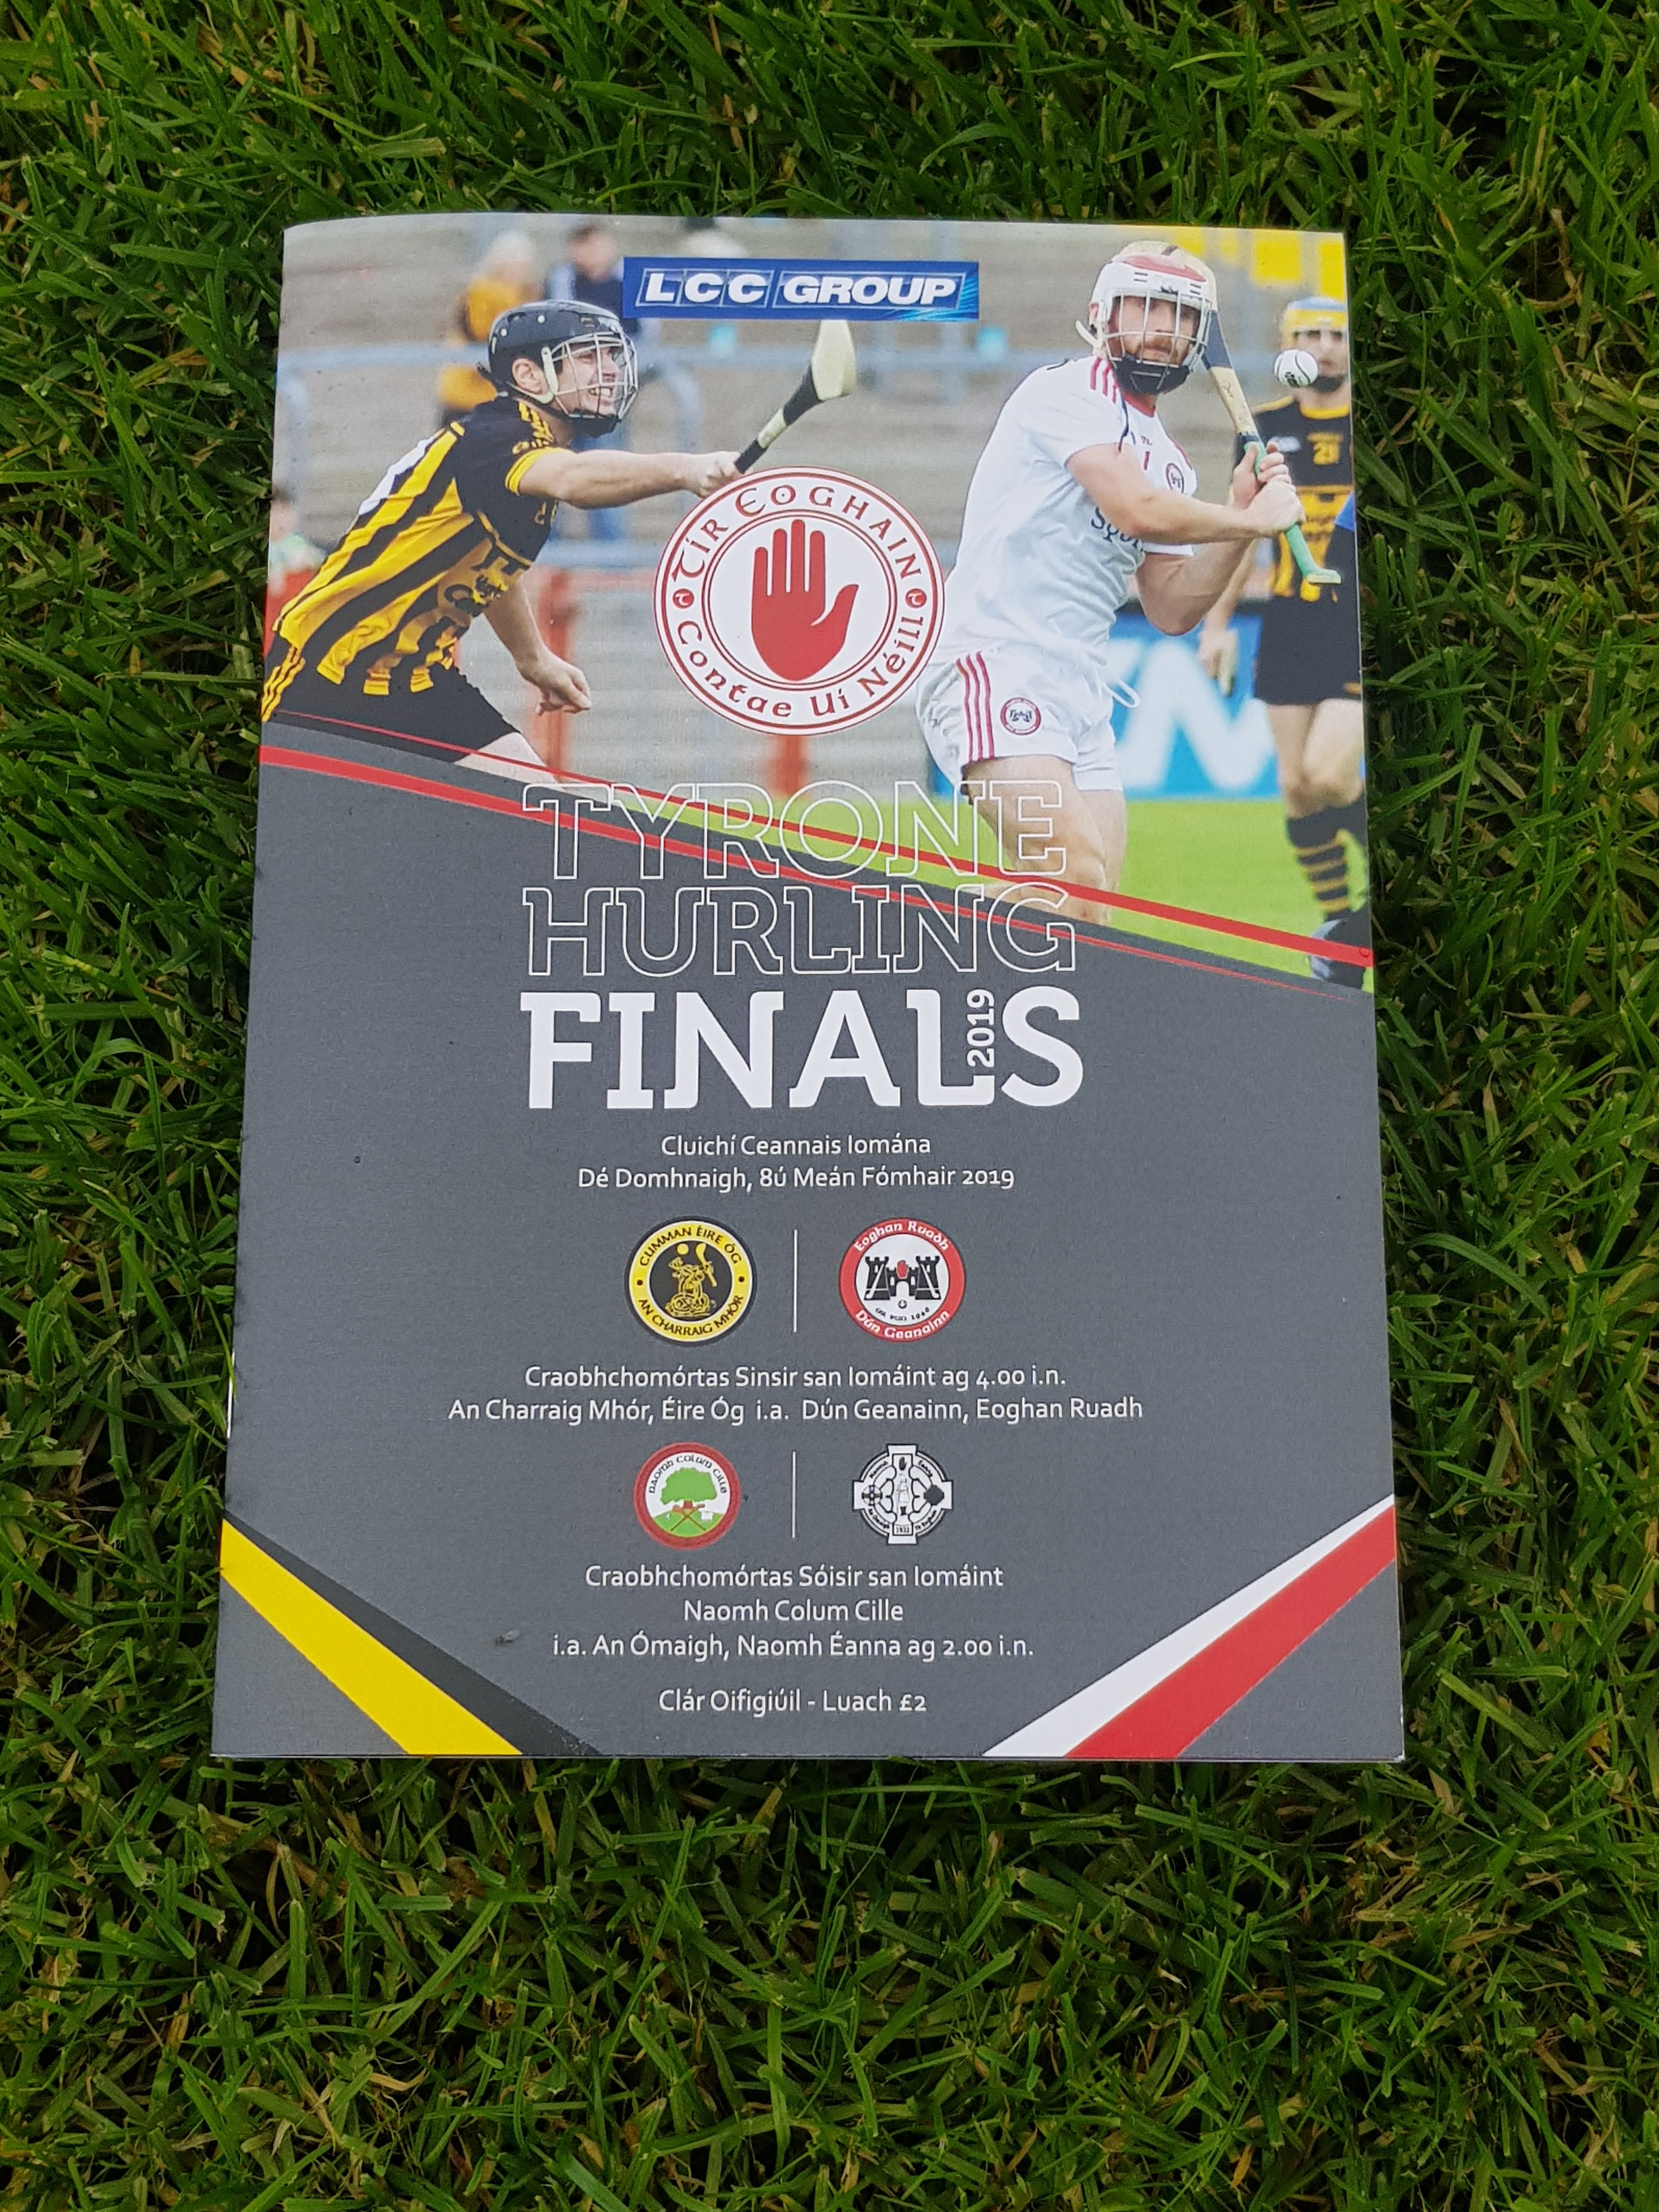 24 page Full Colour Souvenir Programme for LCC Group Senior & Junior Hurling County Finals